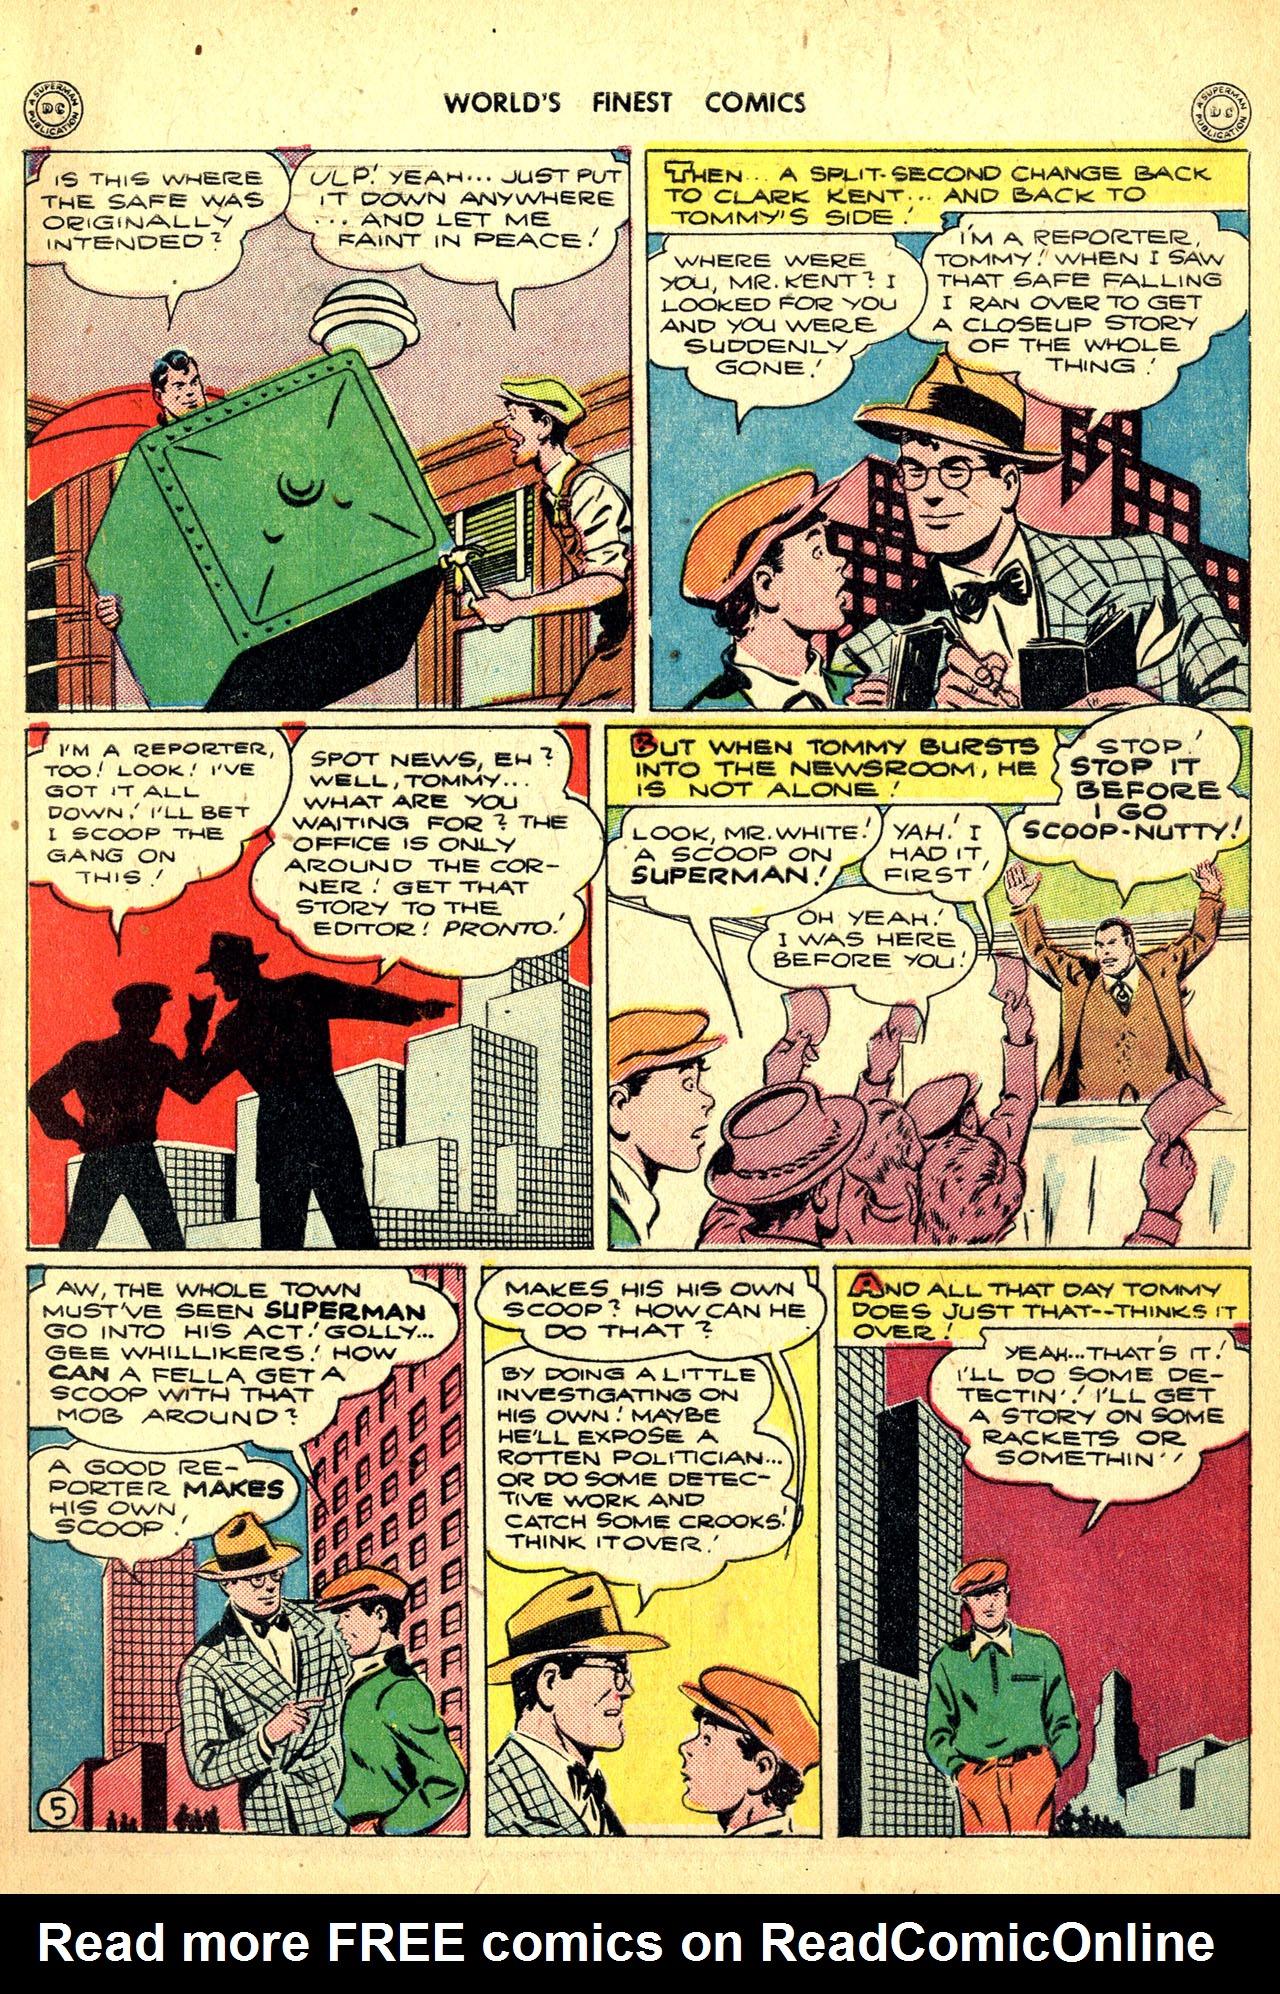 Read online World's Finest Comics comic -  Issue #18 - 7